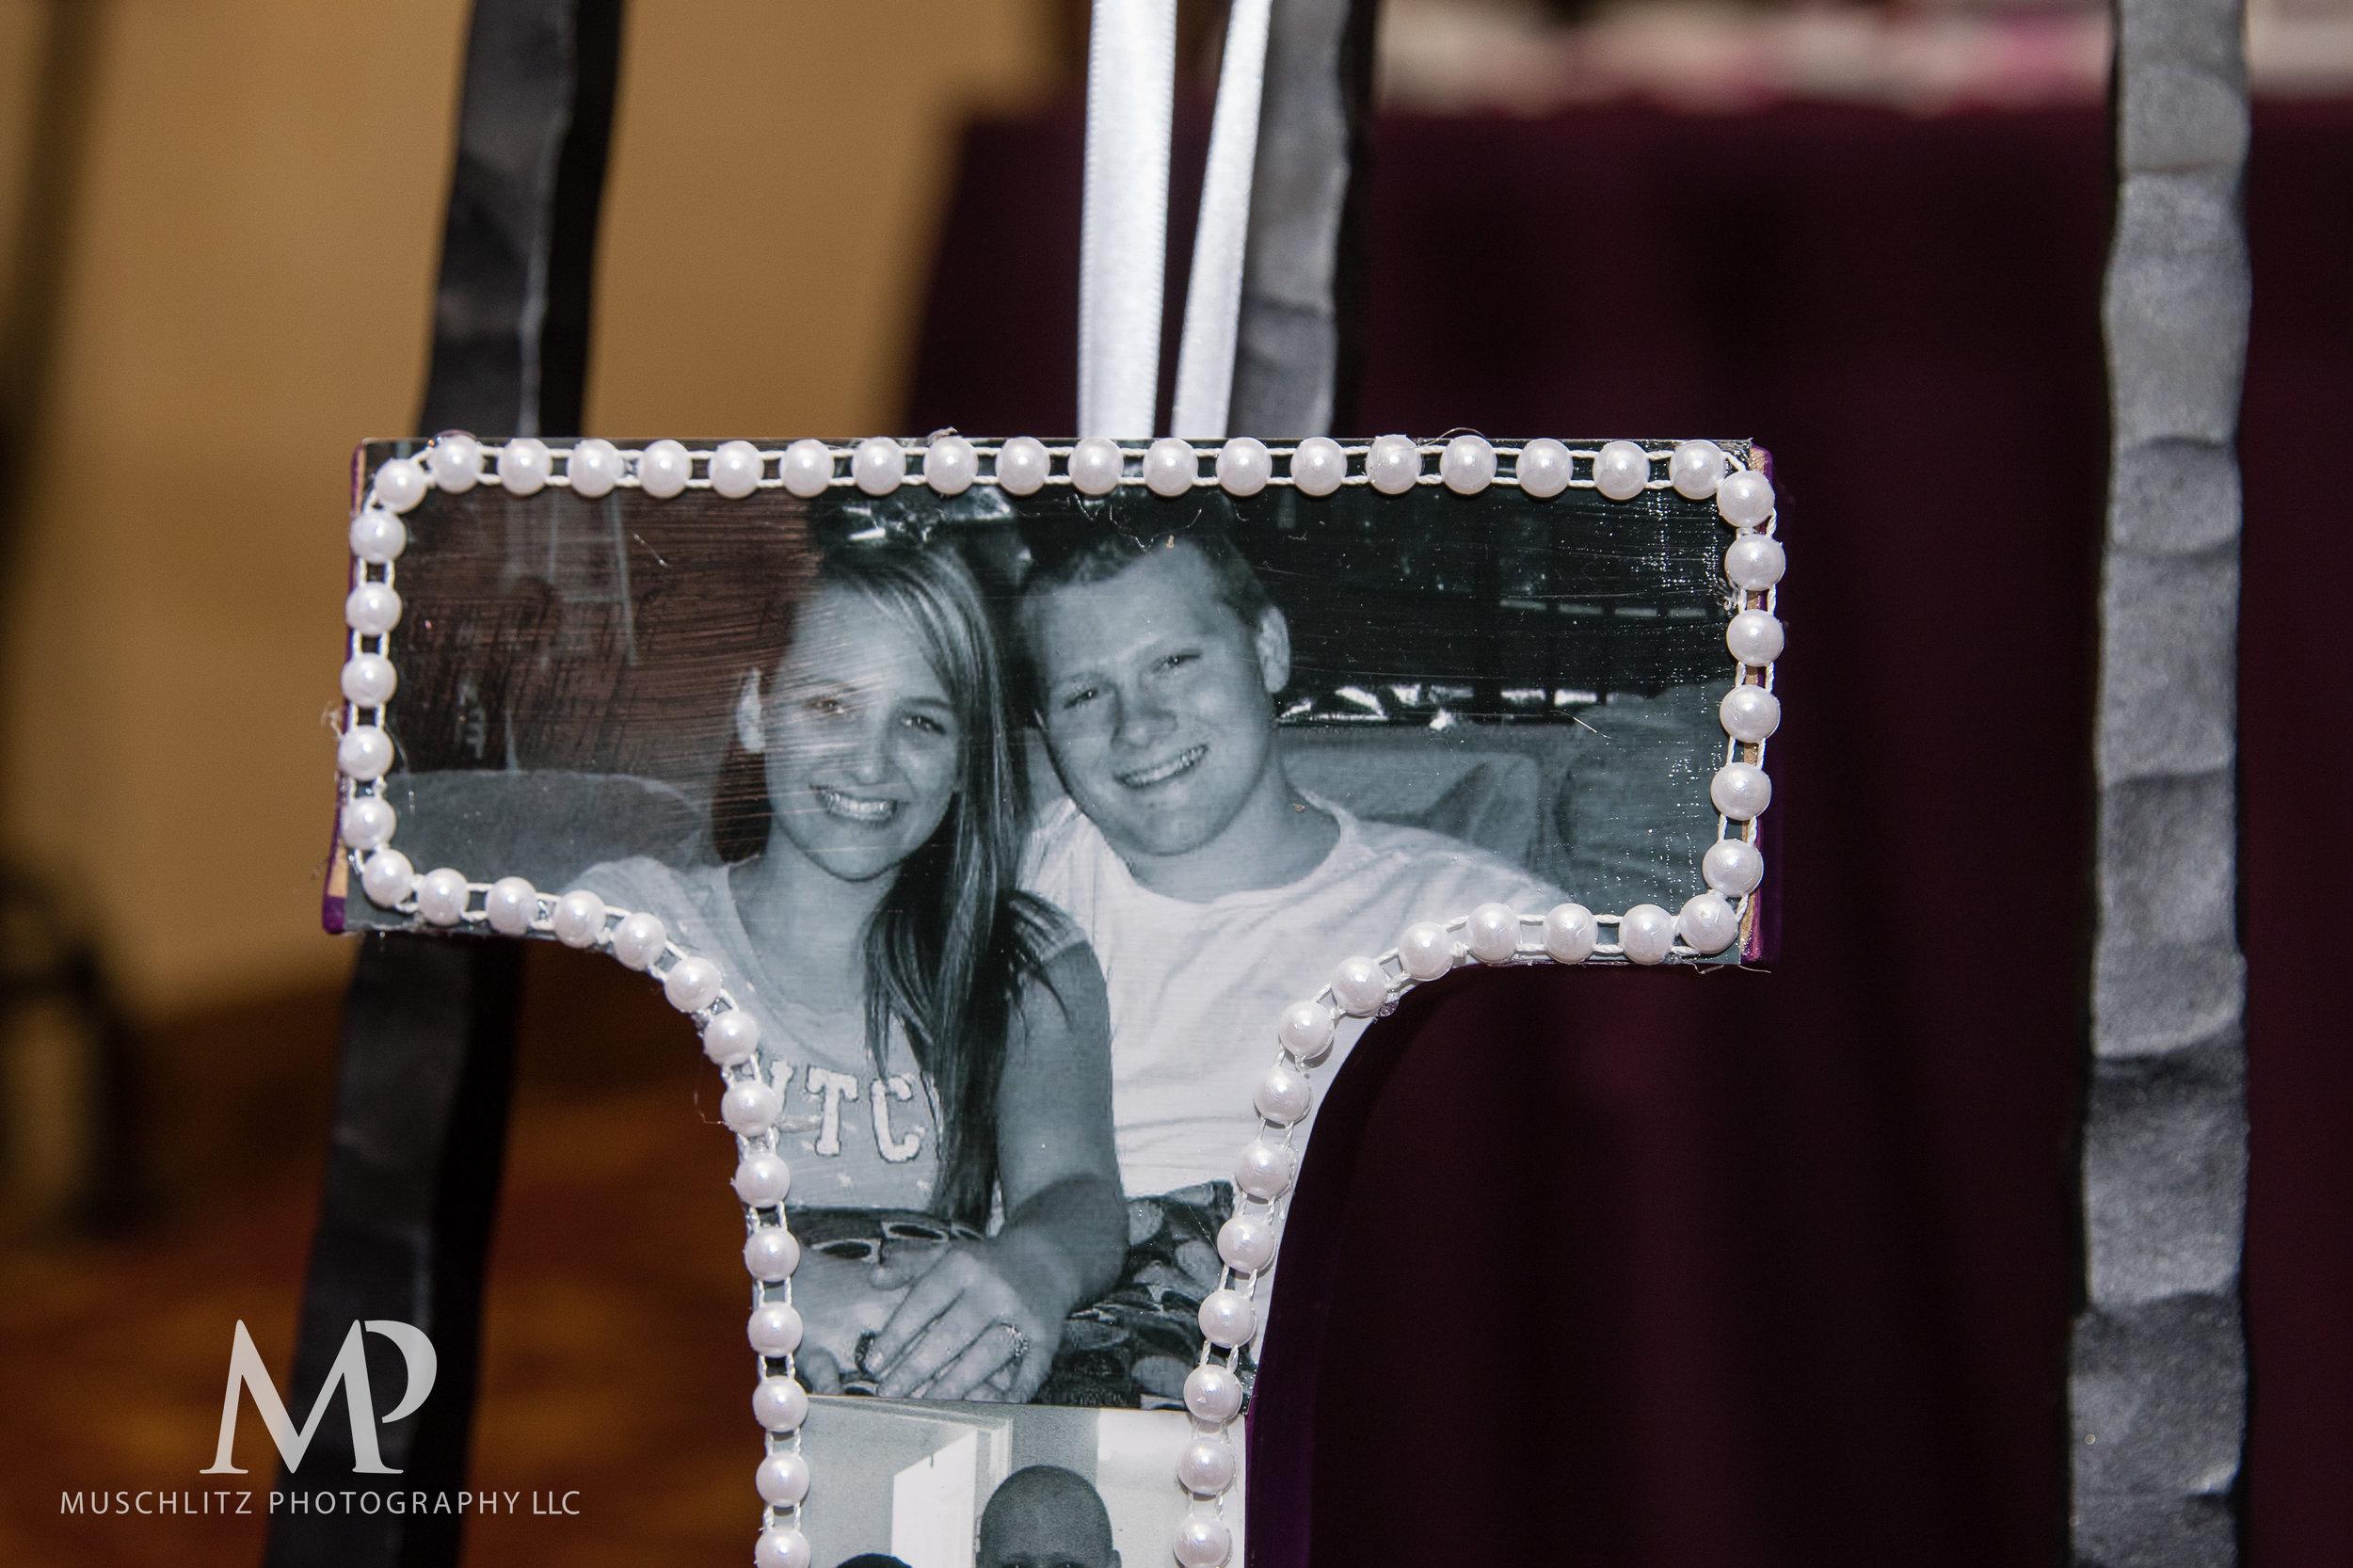 club-at-corazon-wedding-ceremony-reception-columbus-dublin-ohio-ohio-university-theme-077.JPG